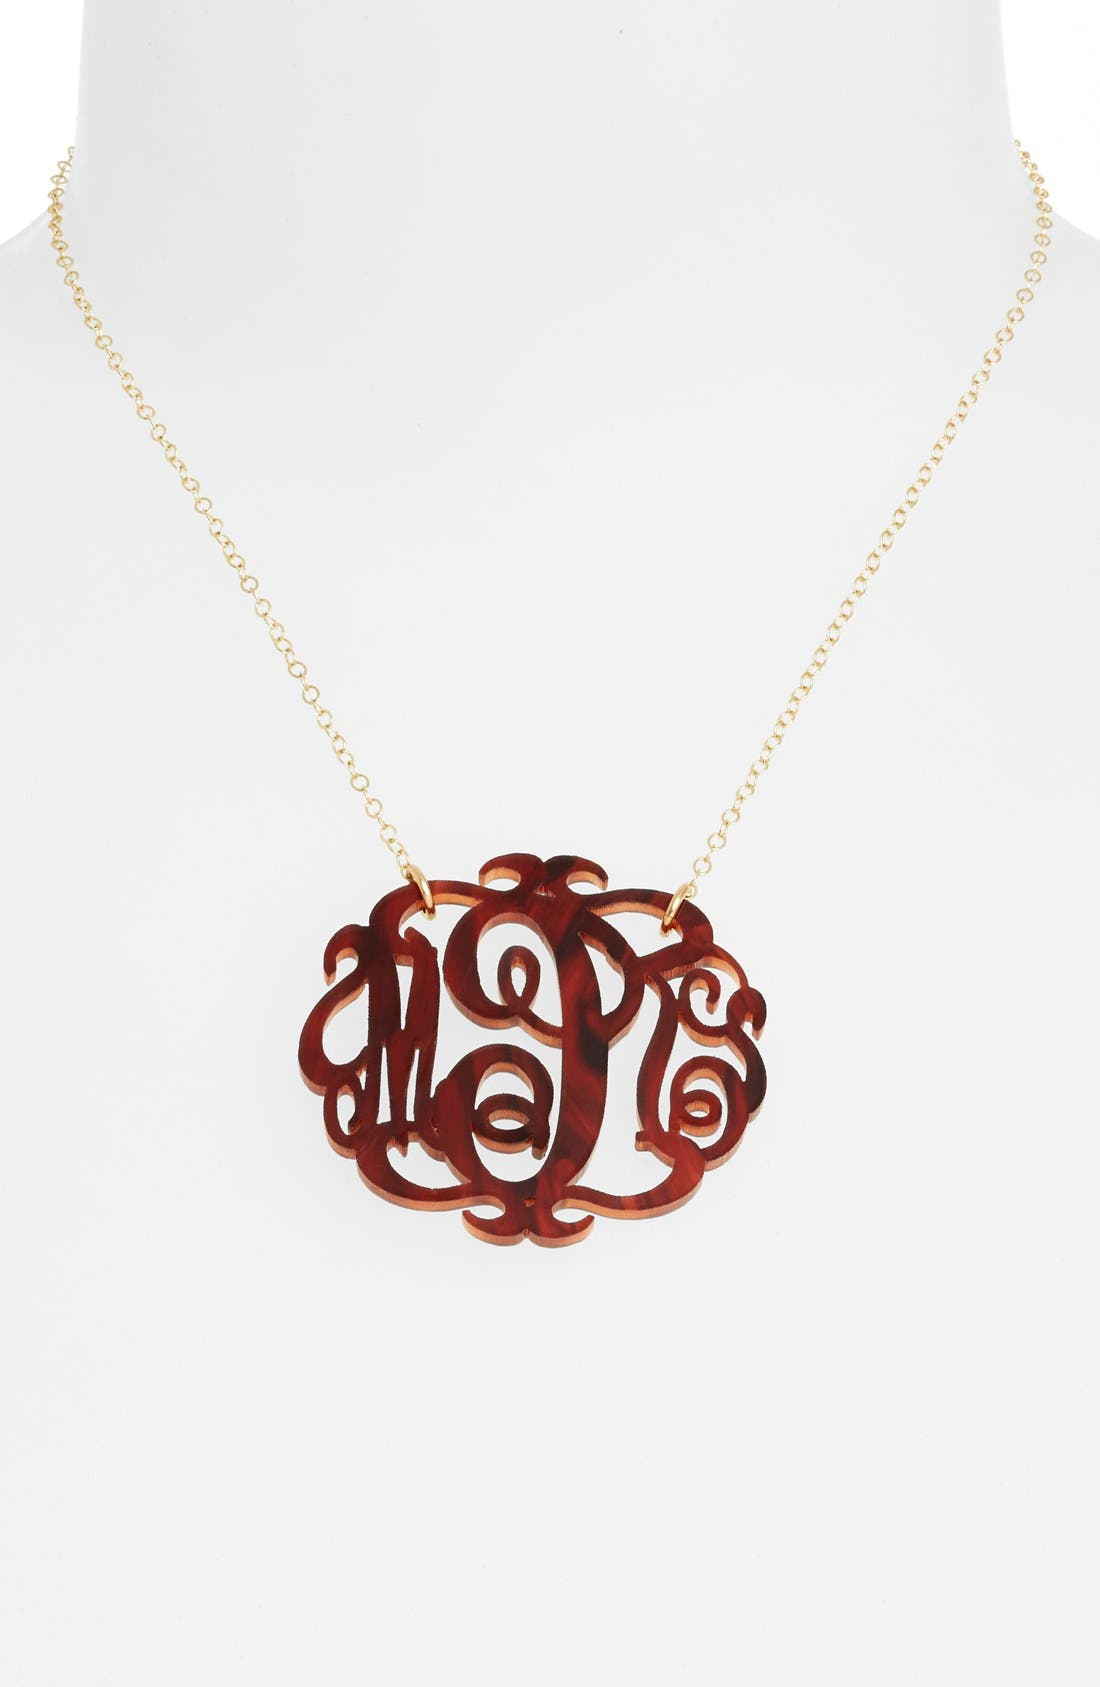 Large Oval Personalized Monogram Pendant Necklace,                             Main thumbnail 1, color,                             TORTOISE/ GOLD